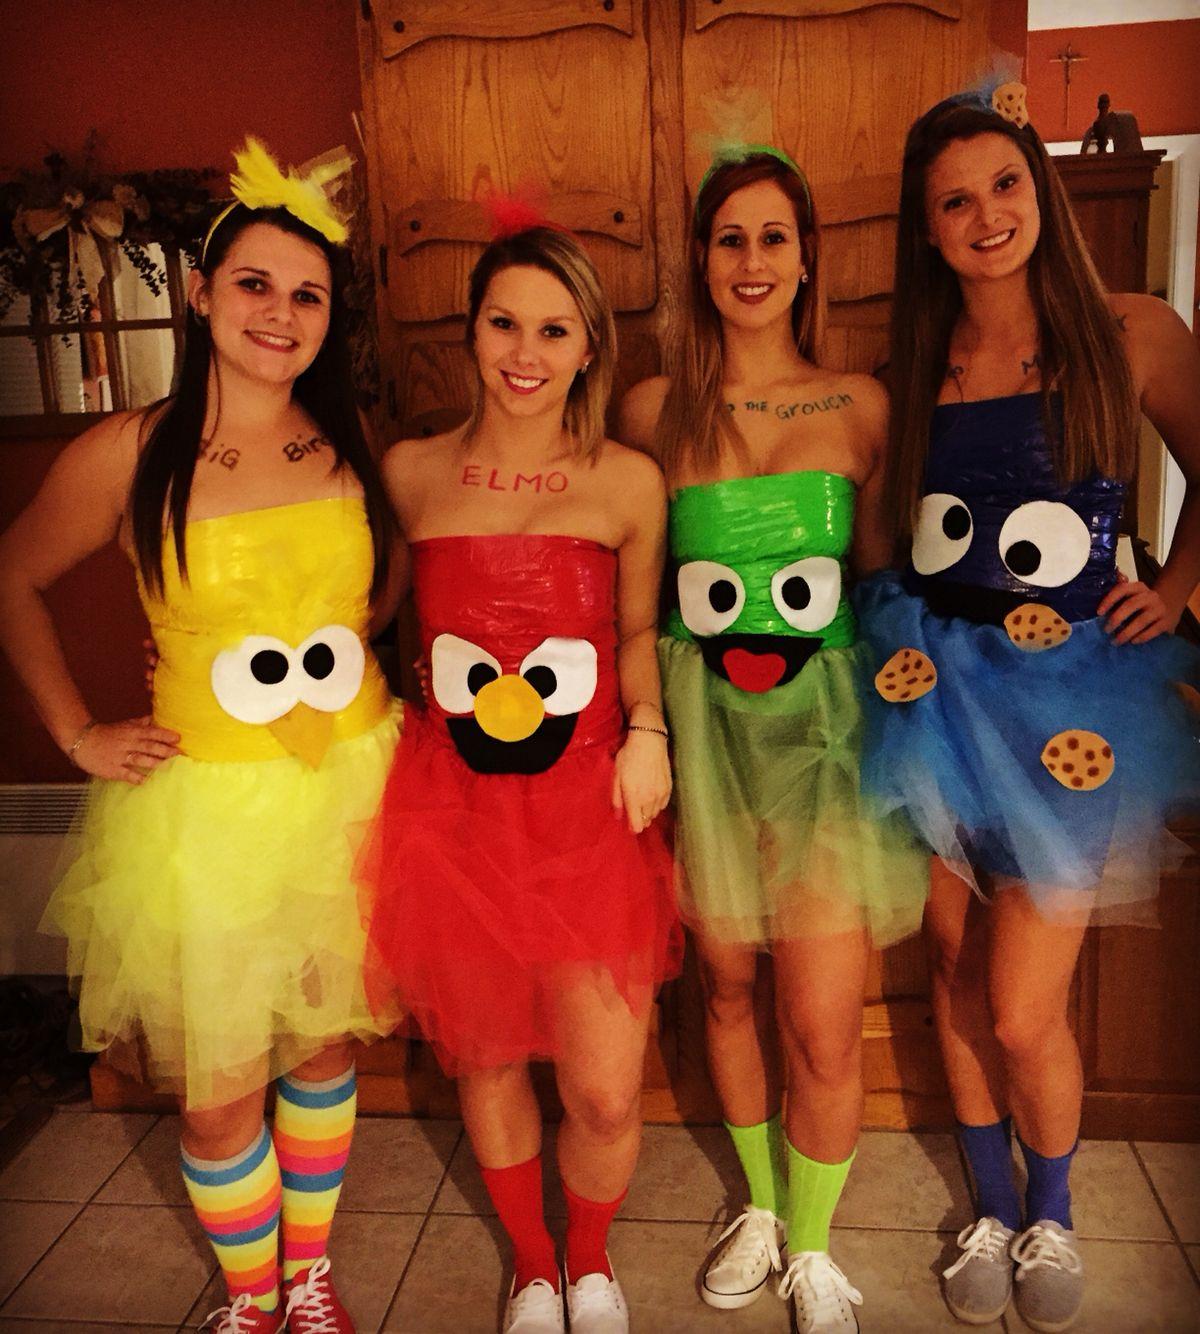 Sésame street costume #bffhalloweencostumes